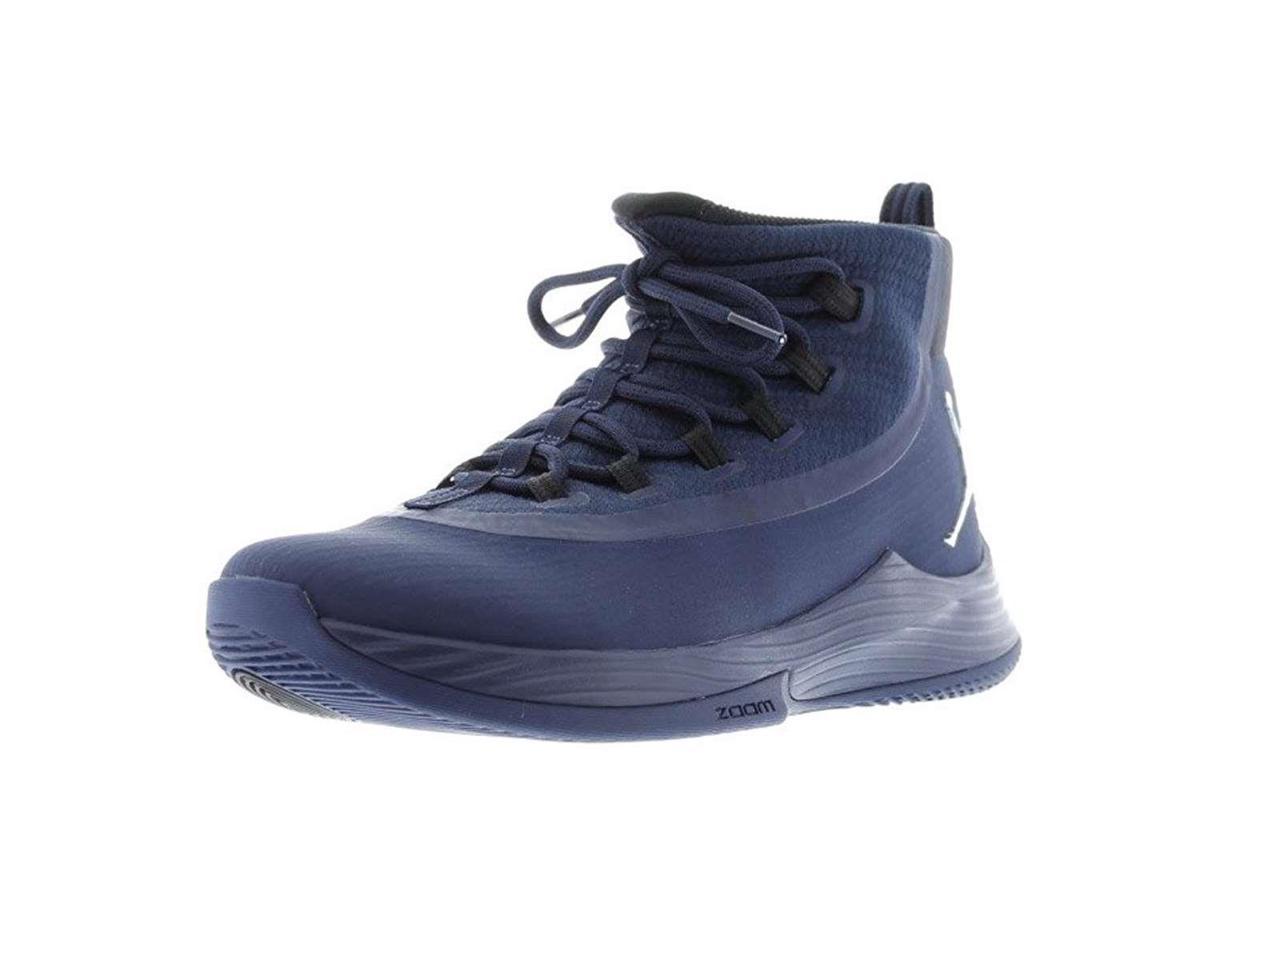 Nike Men Athletic Sneakers Basketball Jordan Ultra Fly 2 Basketball Sneakers Shoes 591f00